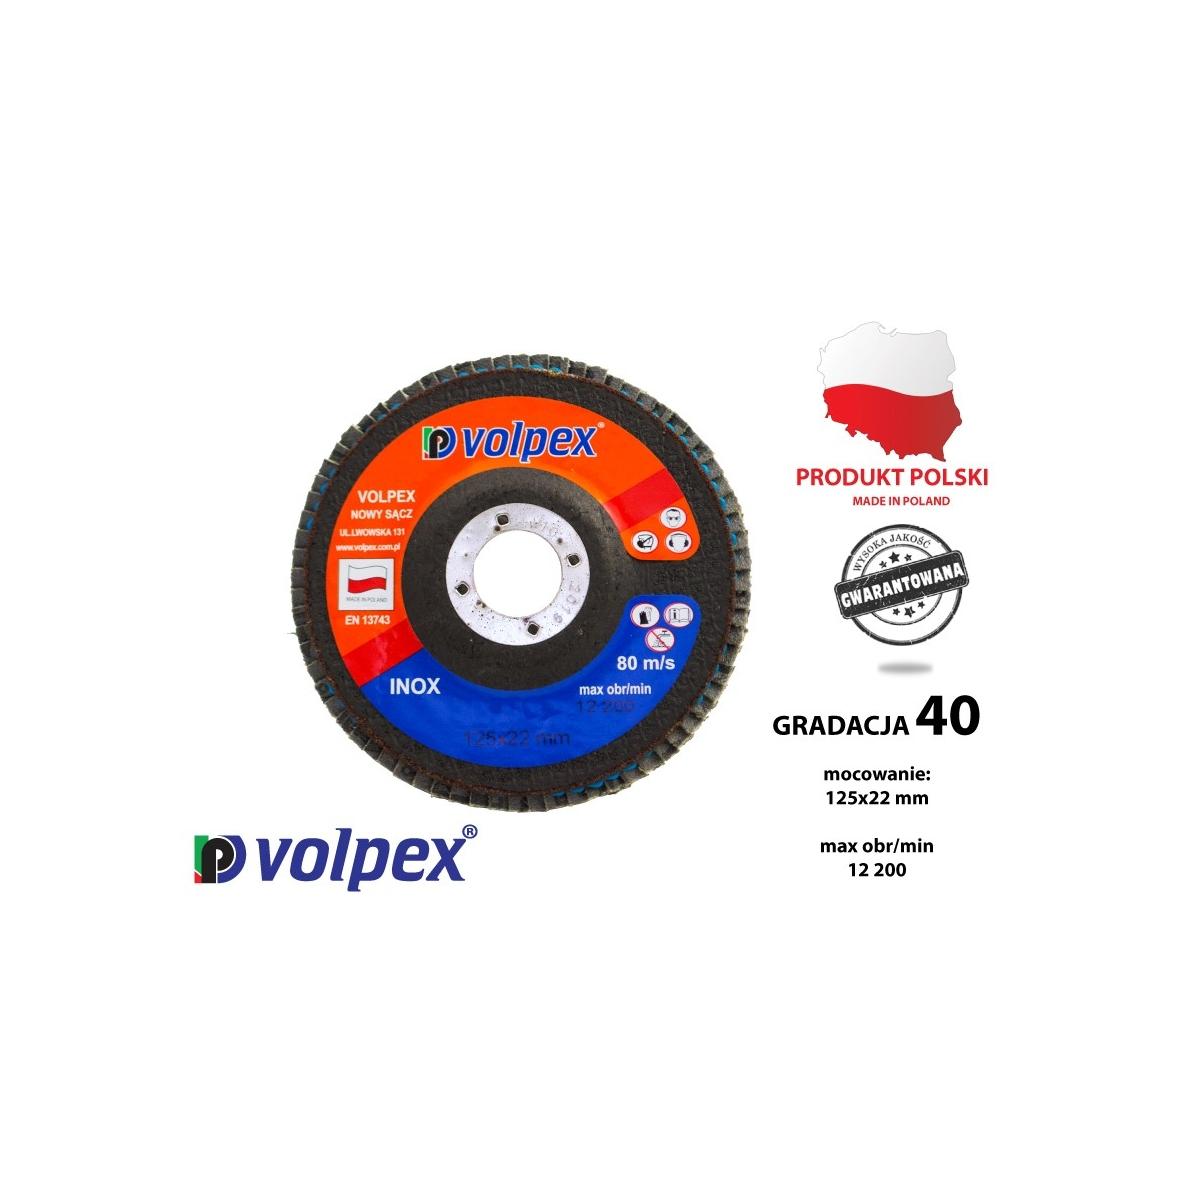 Tarcza płytkowa 125 mm, gradacja 40, inox - VOLPEX Tarcza płytkowa 125 mm, gradacja 40, inox - VOLPEX